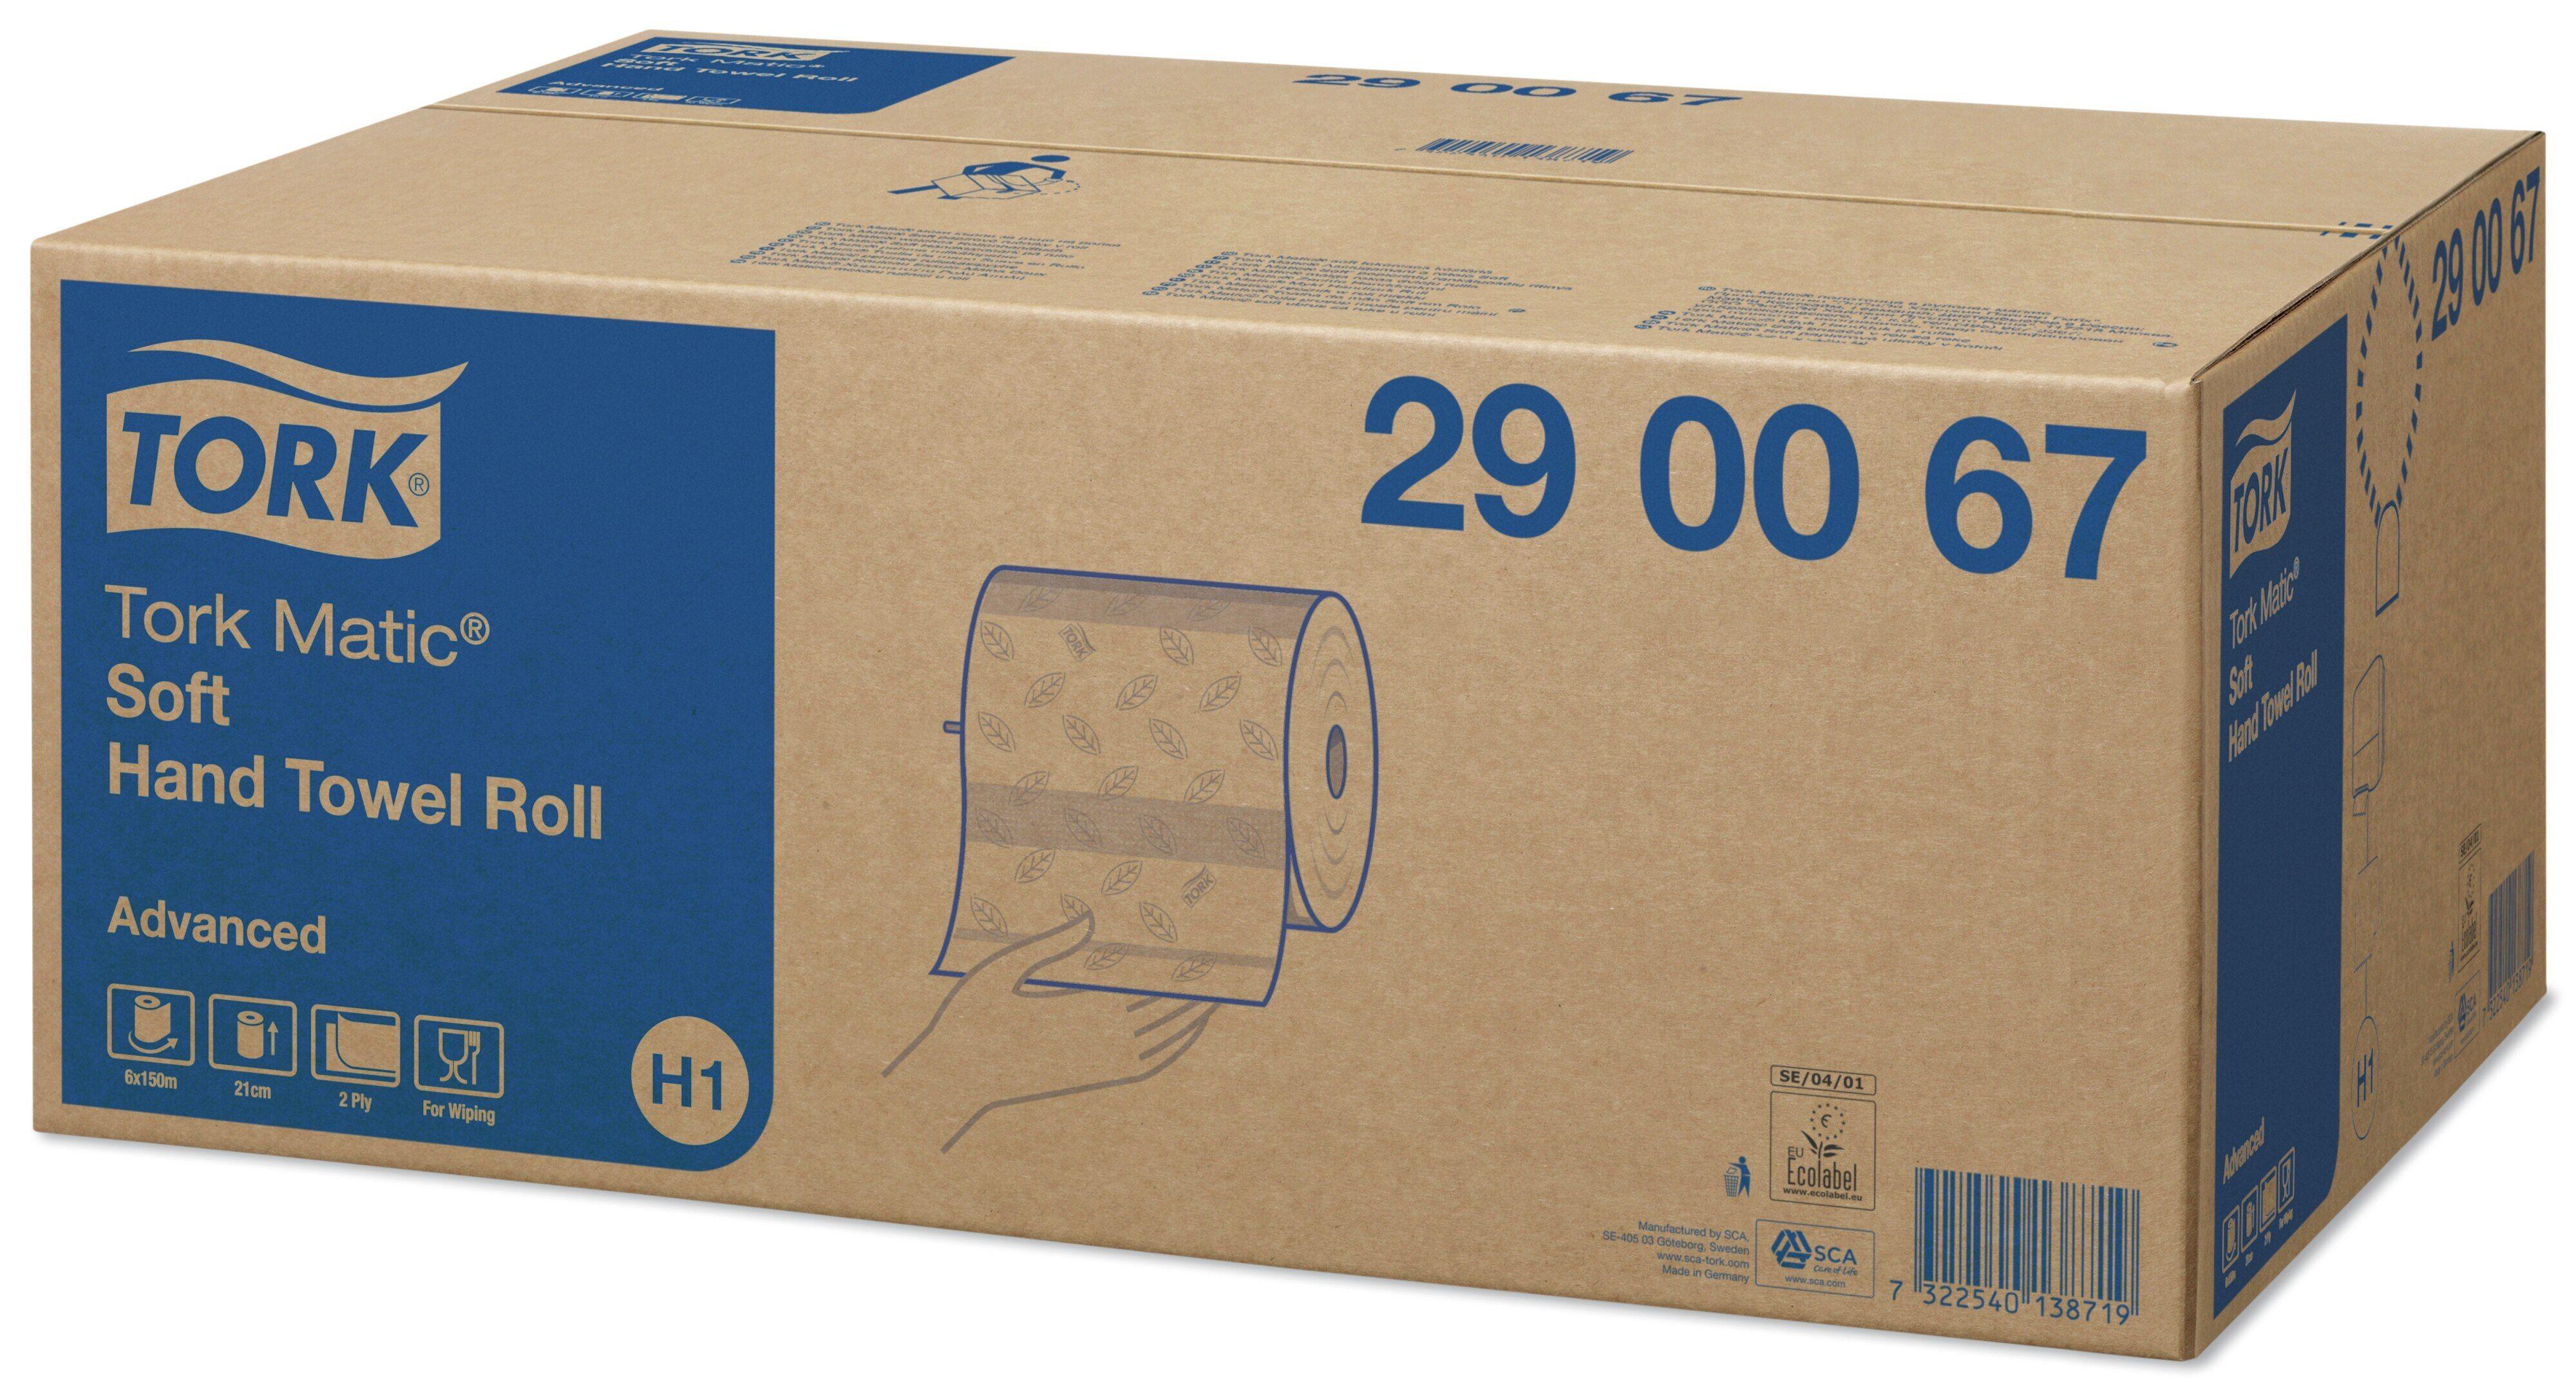 TORK Matic H1 wit handdoekrol 2lg 6rollen 290067